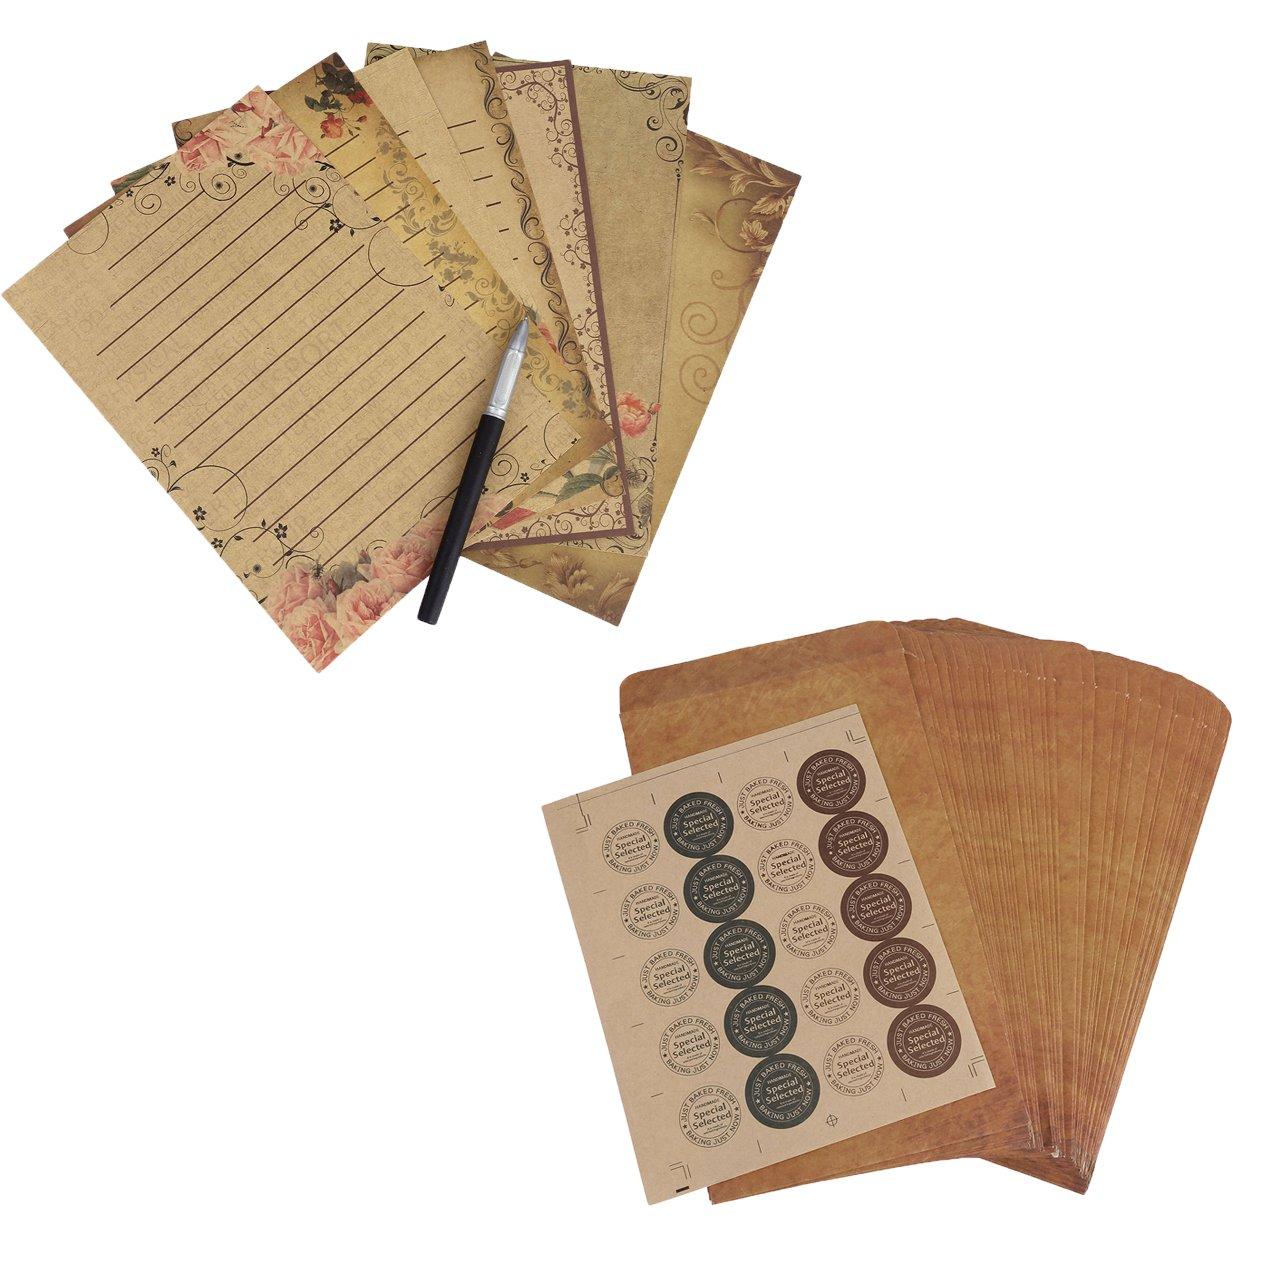 Mogoko Briefpapier-Set, Vintage, Retro, quadratische Briefumschläge Retro Brown (kraft) quadratische Briefumschläge Retro Brown (kraft) MMUS2016884